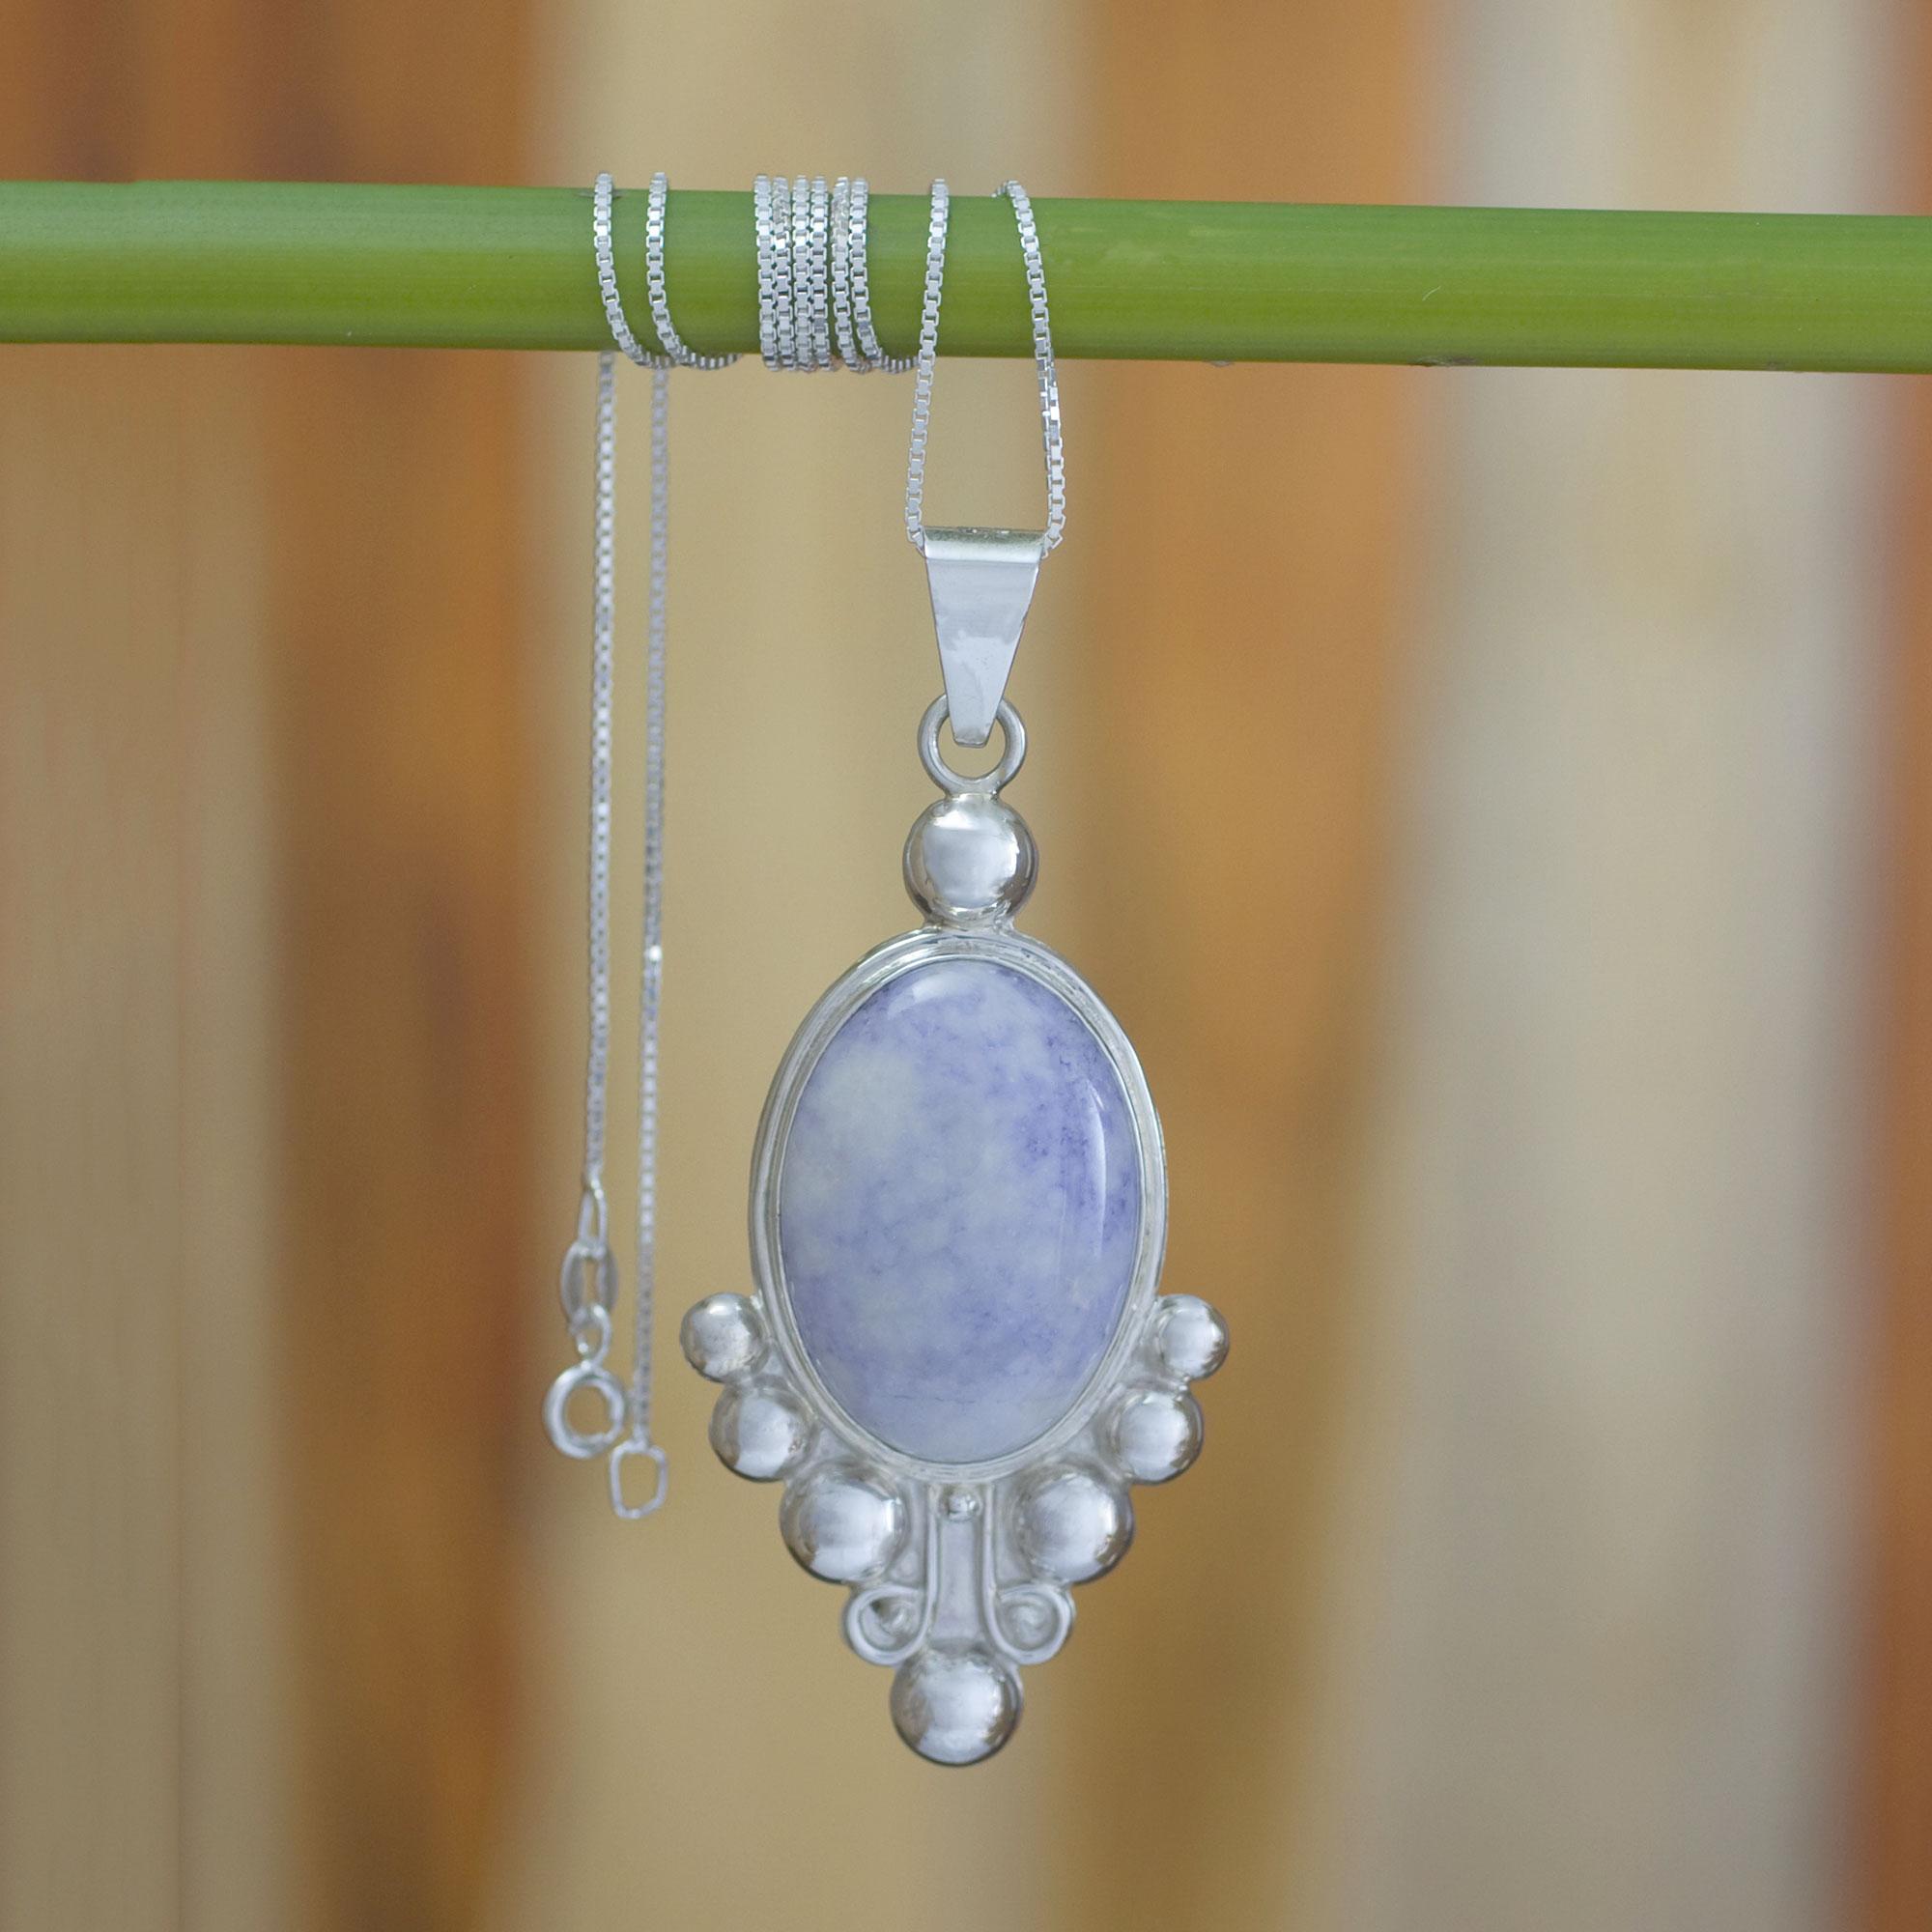 18 Delicate Soul NOVICA .925 Sterling Silver Pendant Necklace